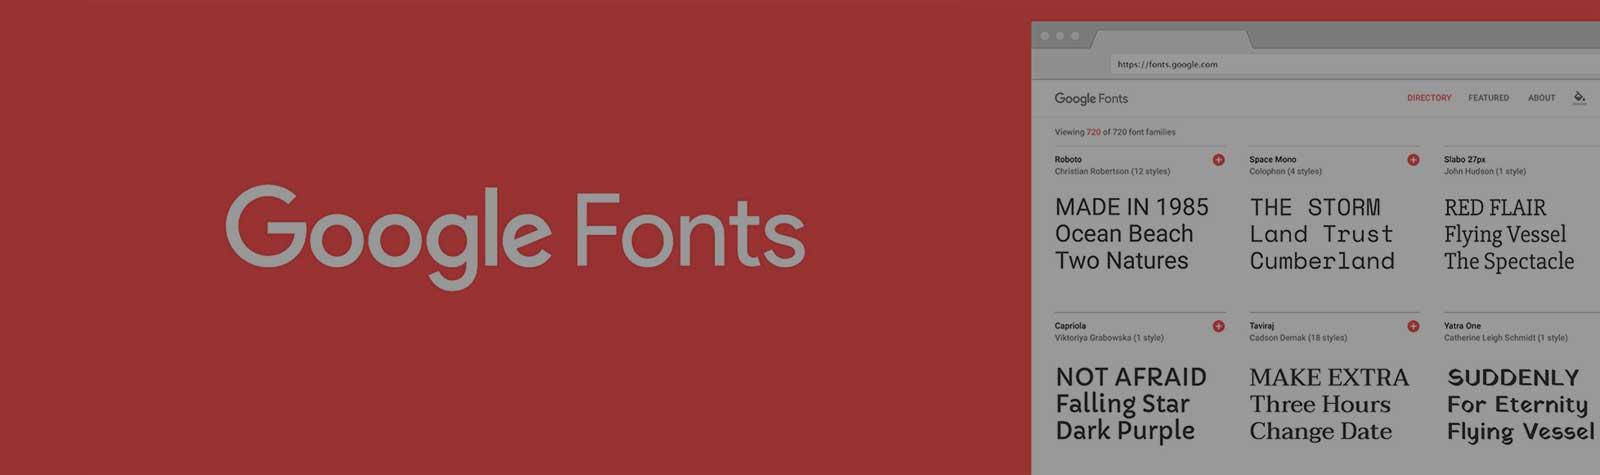 Google Fonts en WordPress ¿Cómo implementarlo?